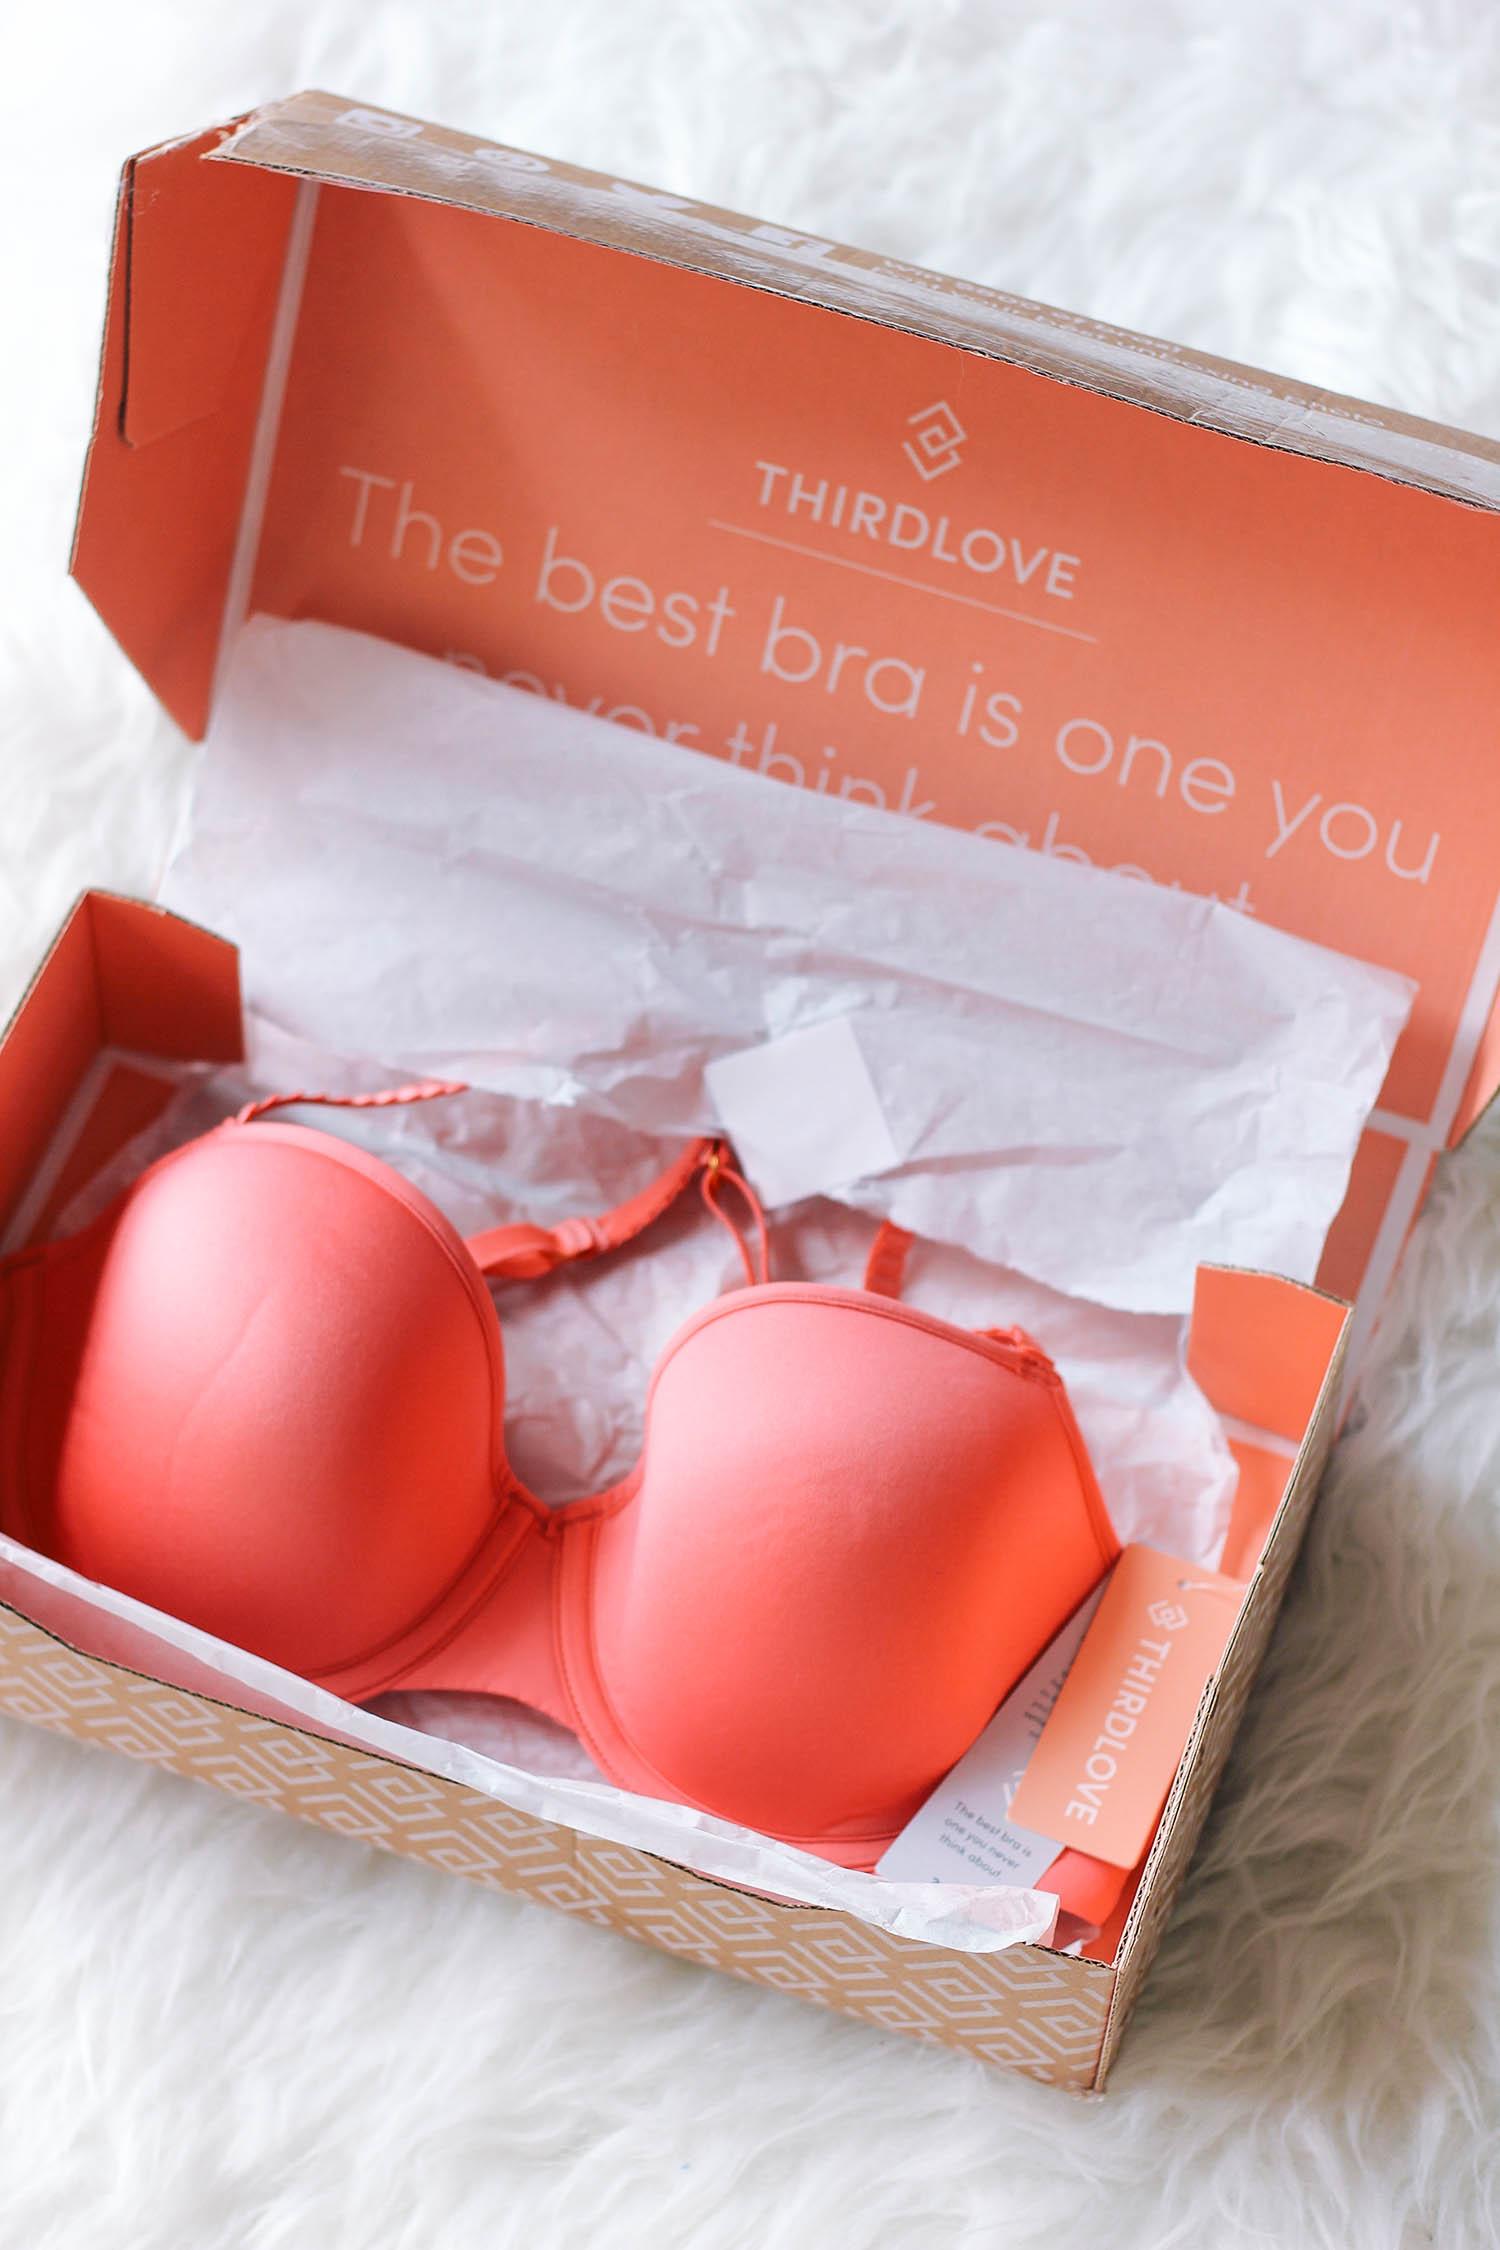 third-love-bra-5